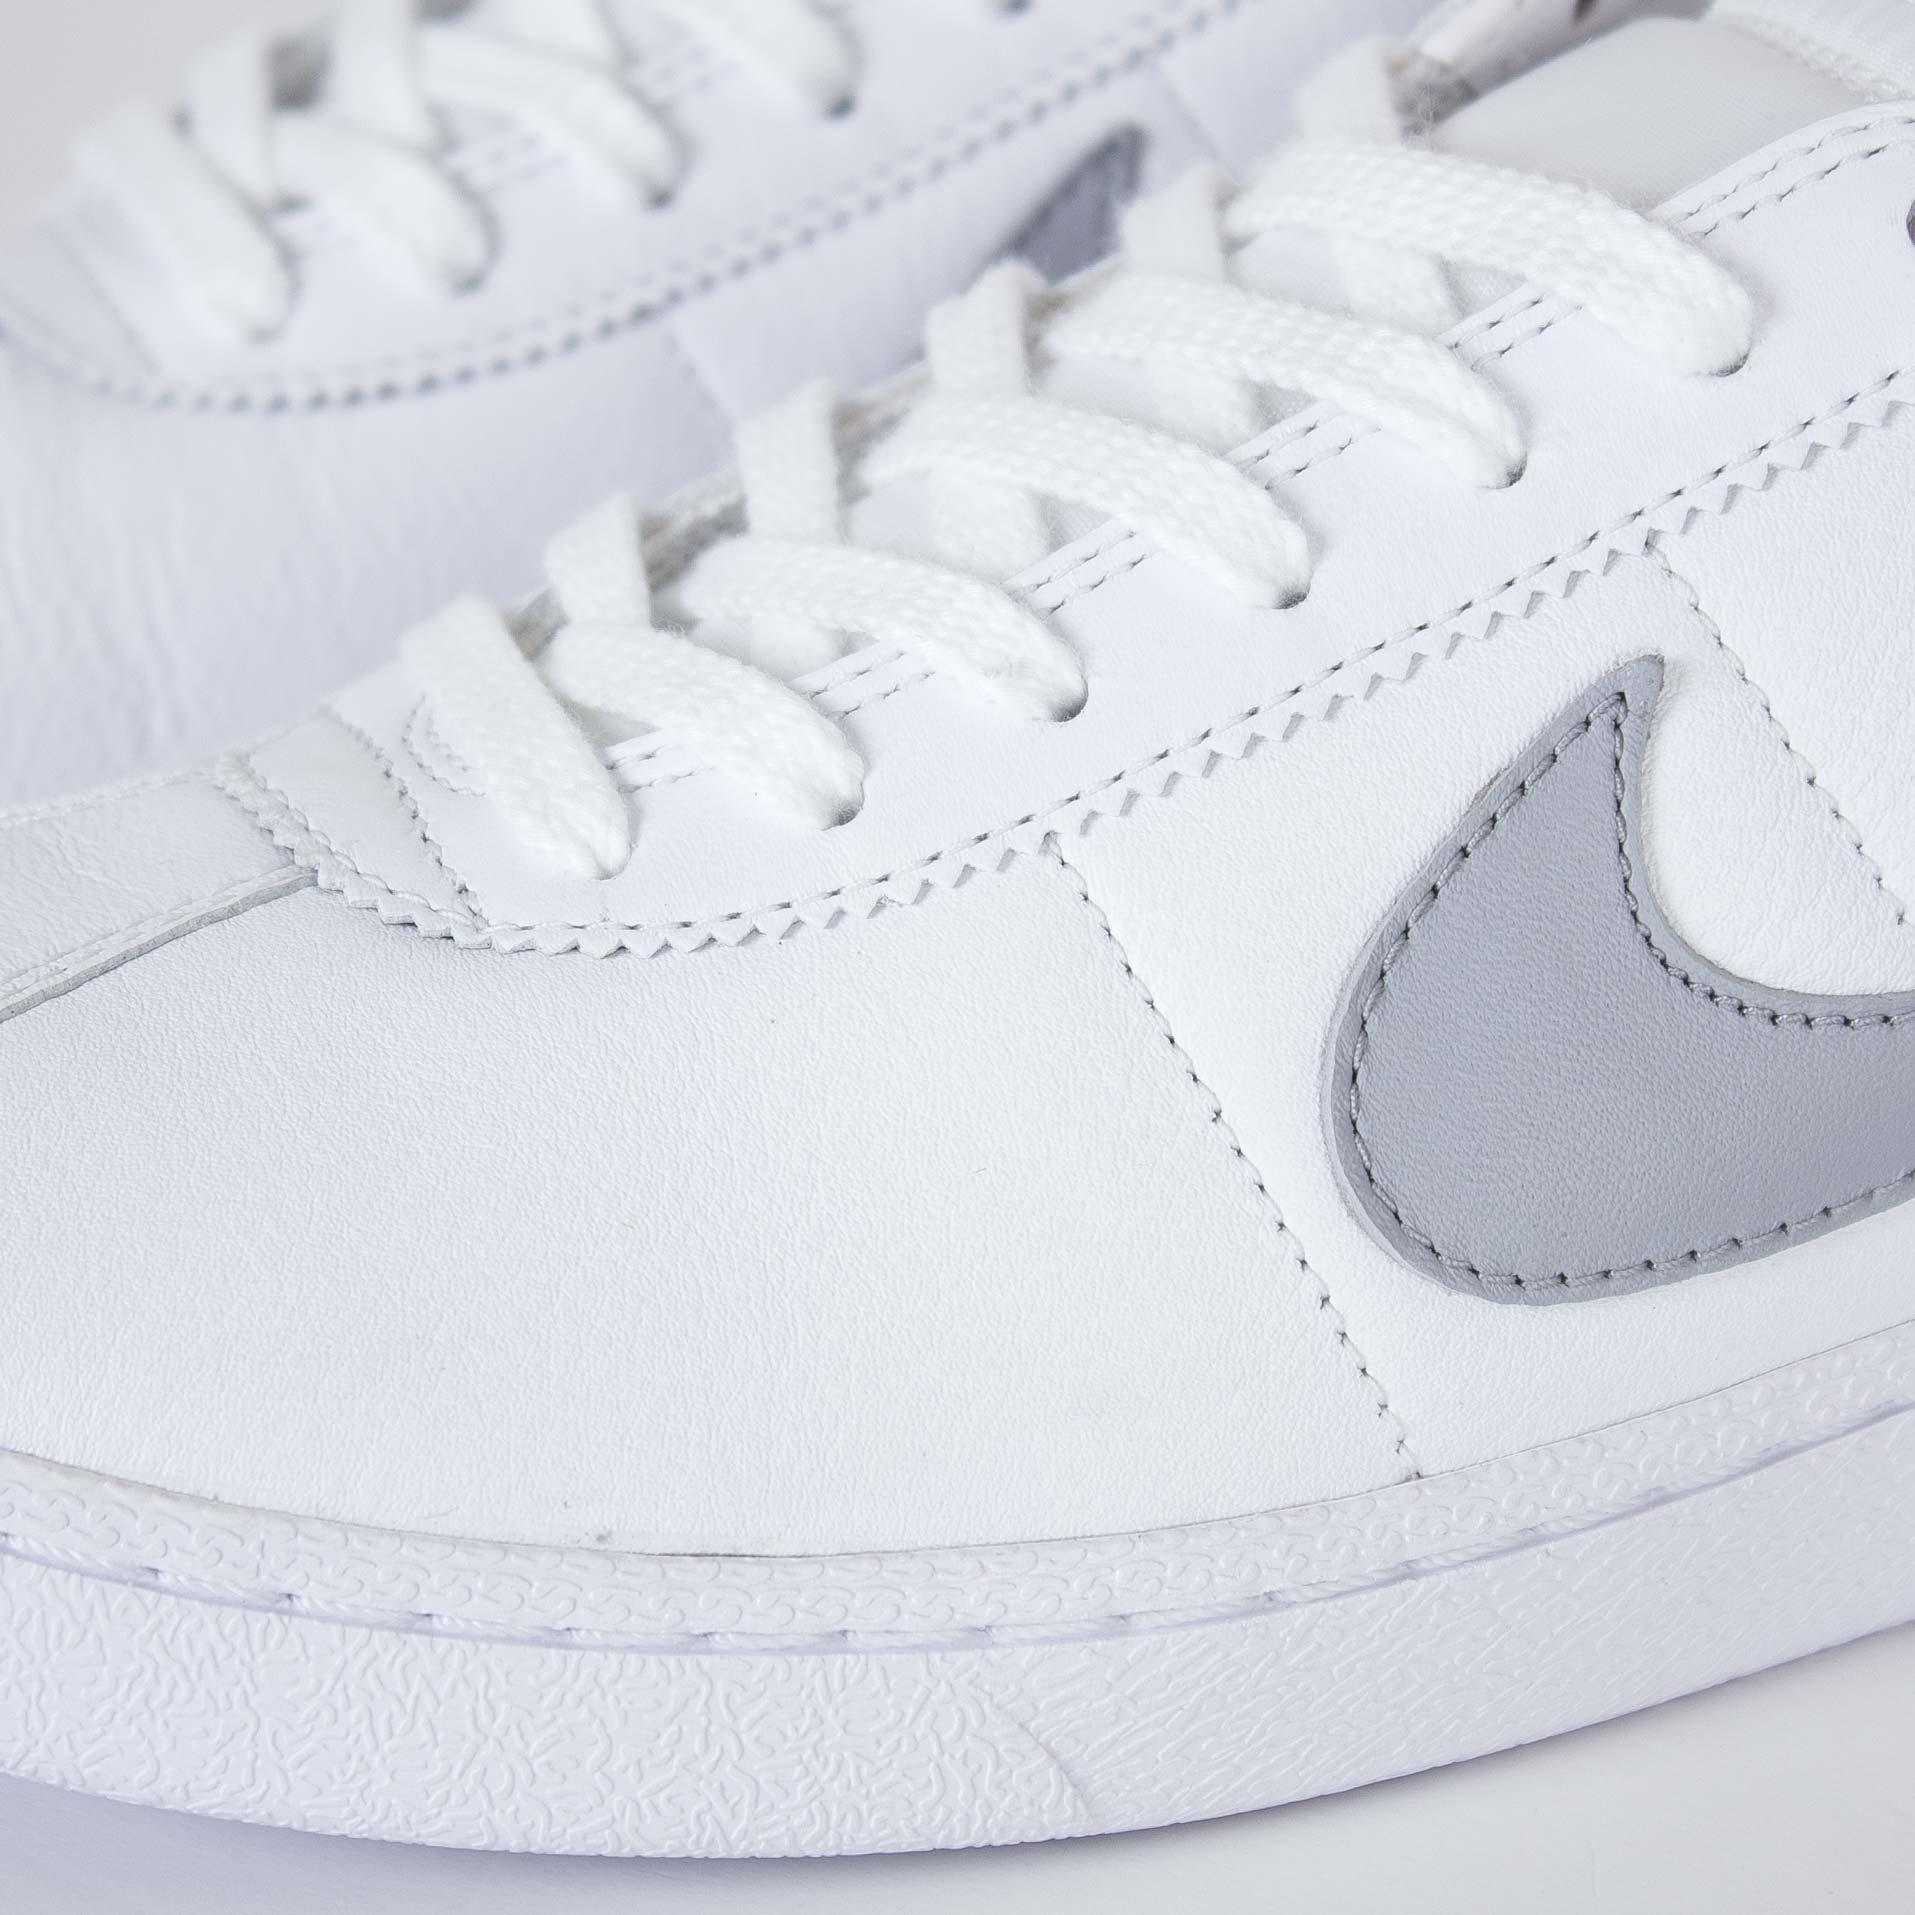 3b11165057f1 Nike Bruin Leather - 826670-100 - Sneakersnstuff